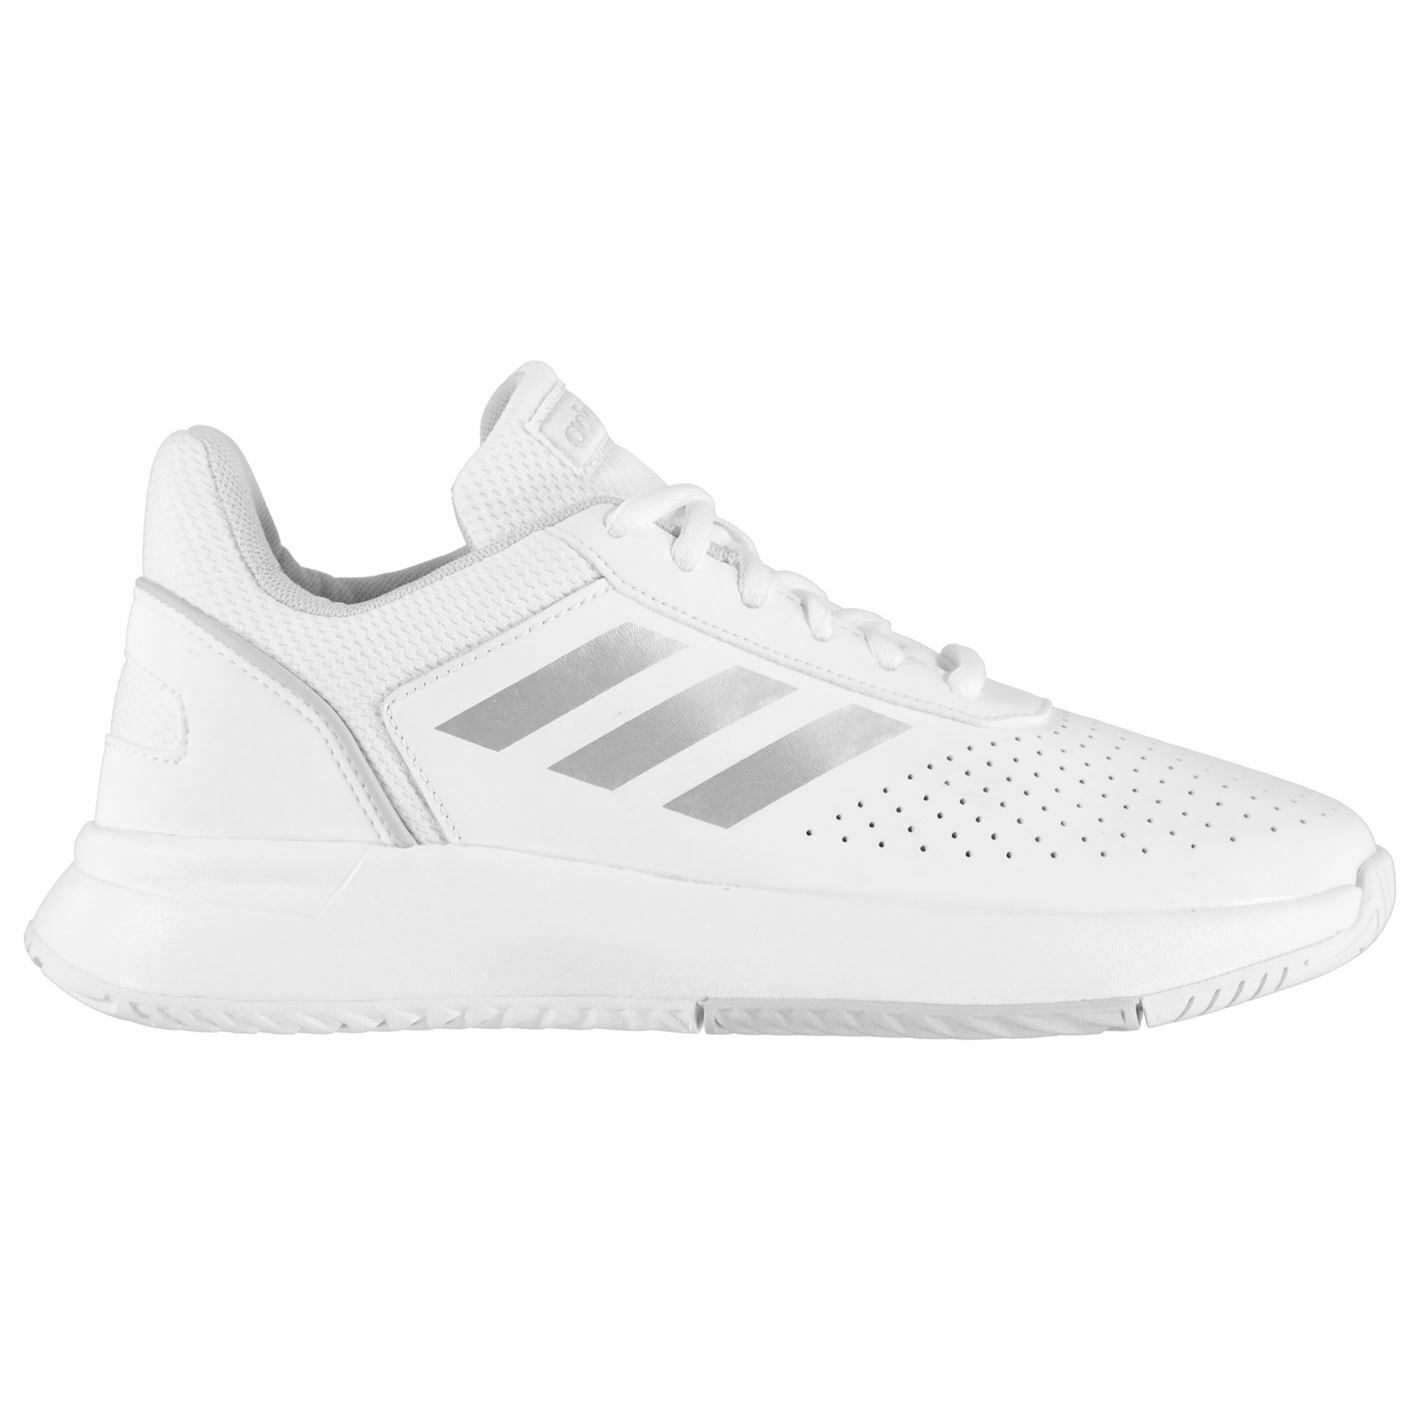 Adidas Damen Courtsmash Tennis Schuhe Turnschuhe Turnschuhe